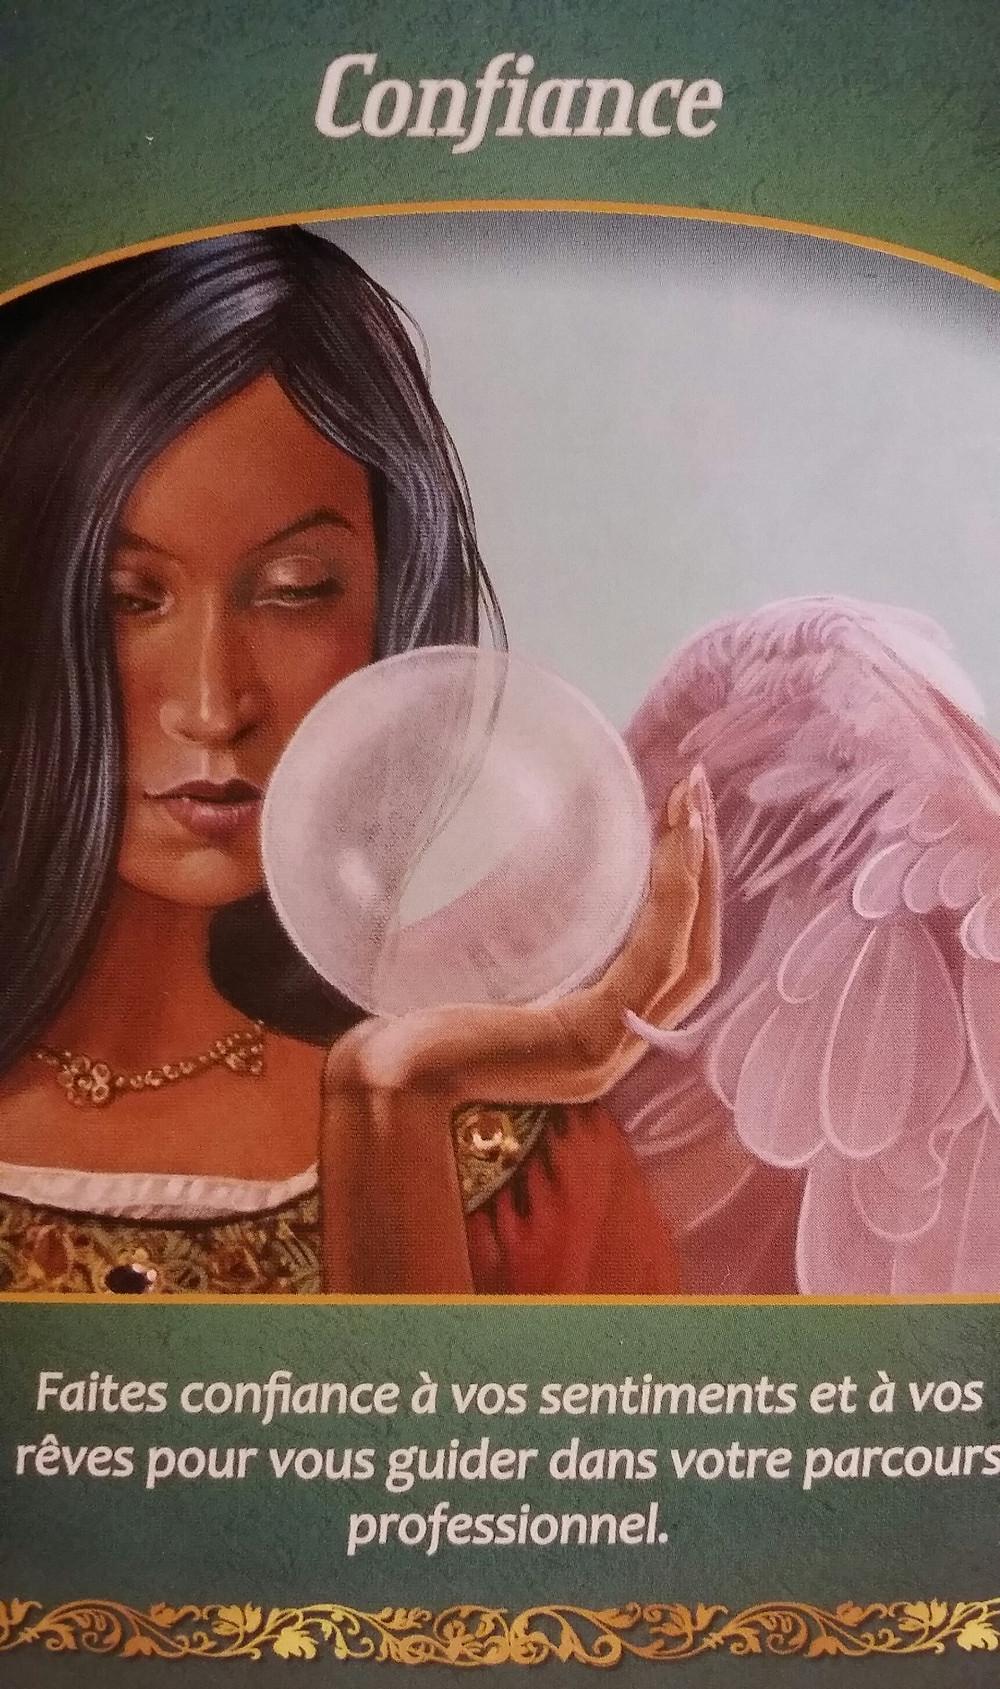 jeu le sens de la vie, la confiance, doreen virtue, lemondedekokolou.com